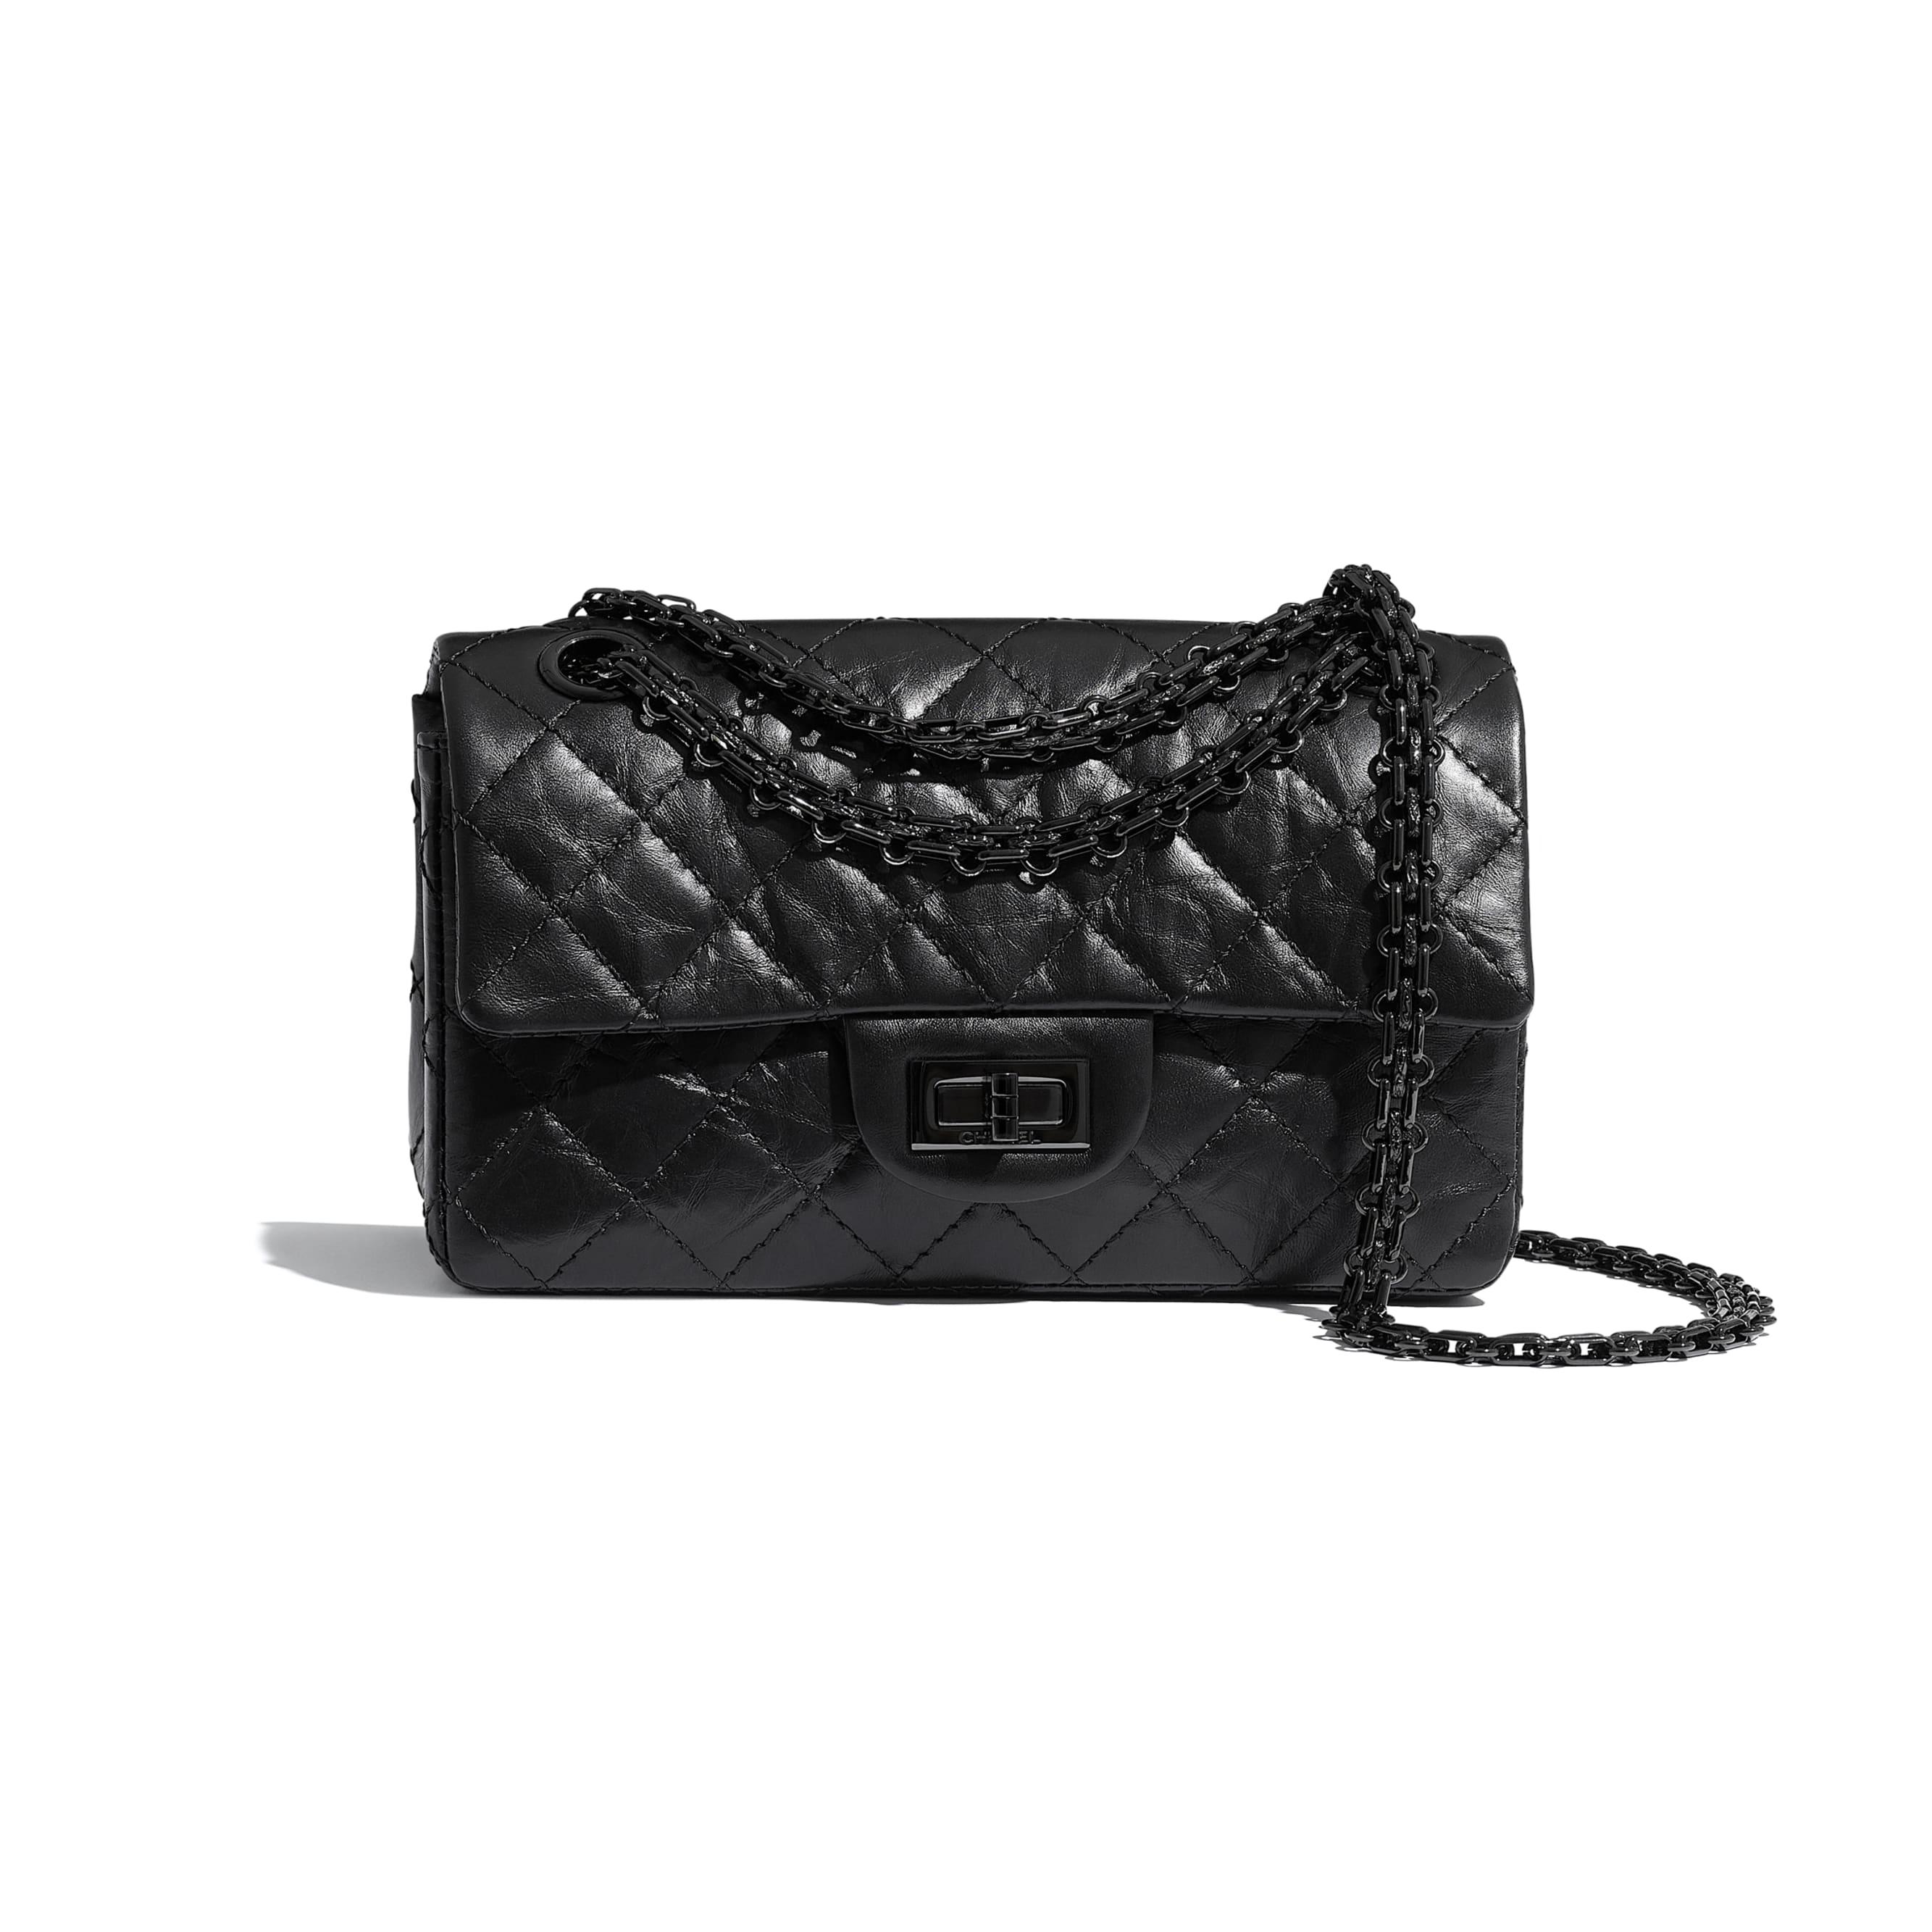 Mini 2.55 Handbag - Black - Aged Calfskin & Black Metal - CHANEL - Default view - see standard sized version